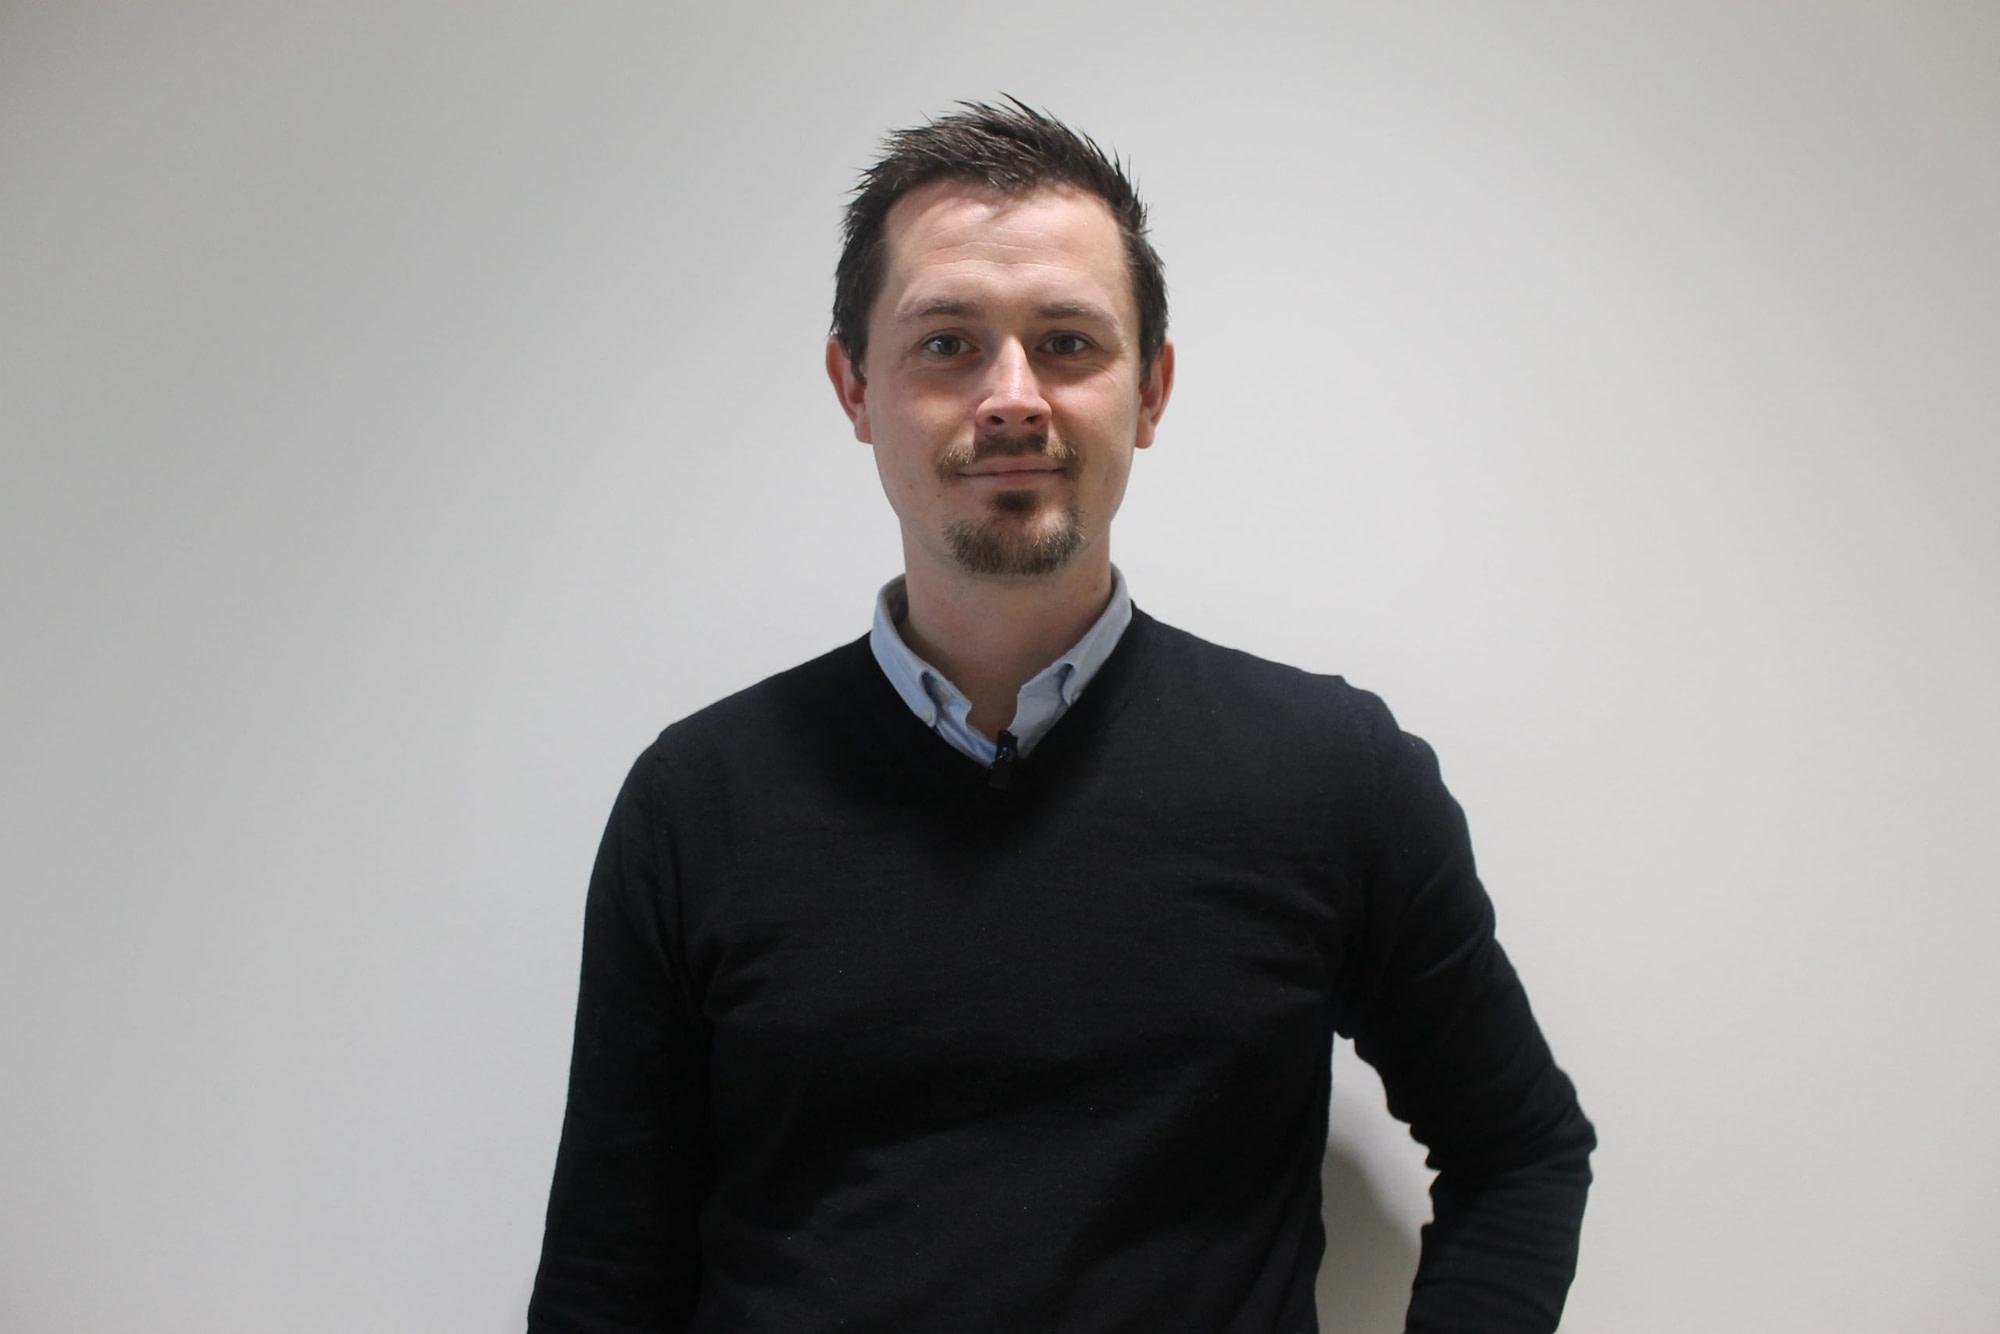 Foredragsholder Søren Matthiesen Unge stof fer og misbrug web scaled